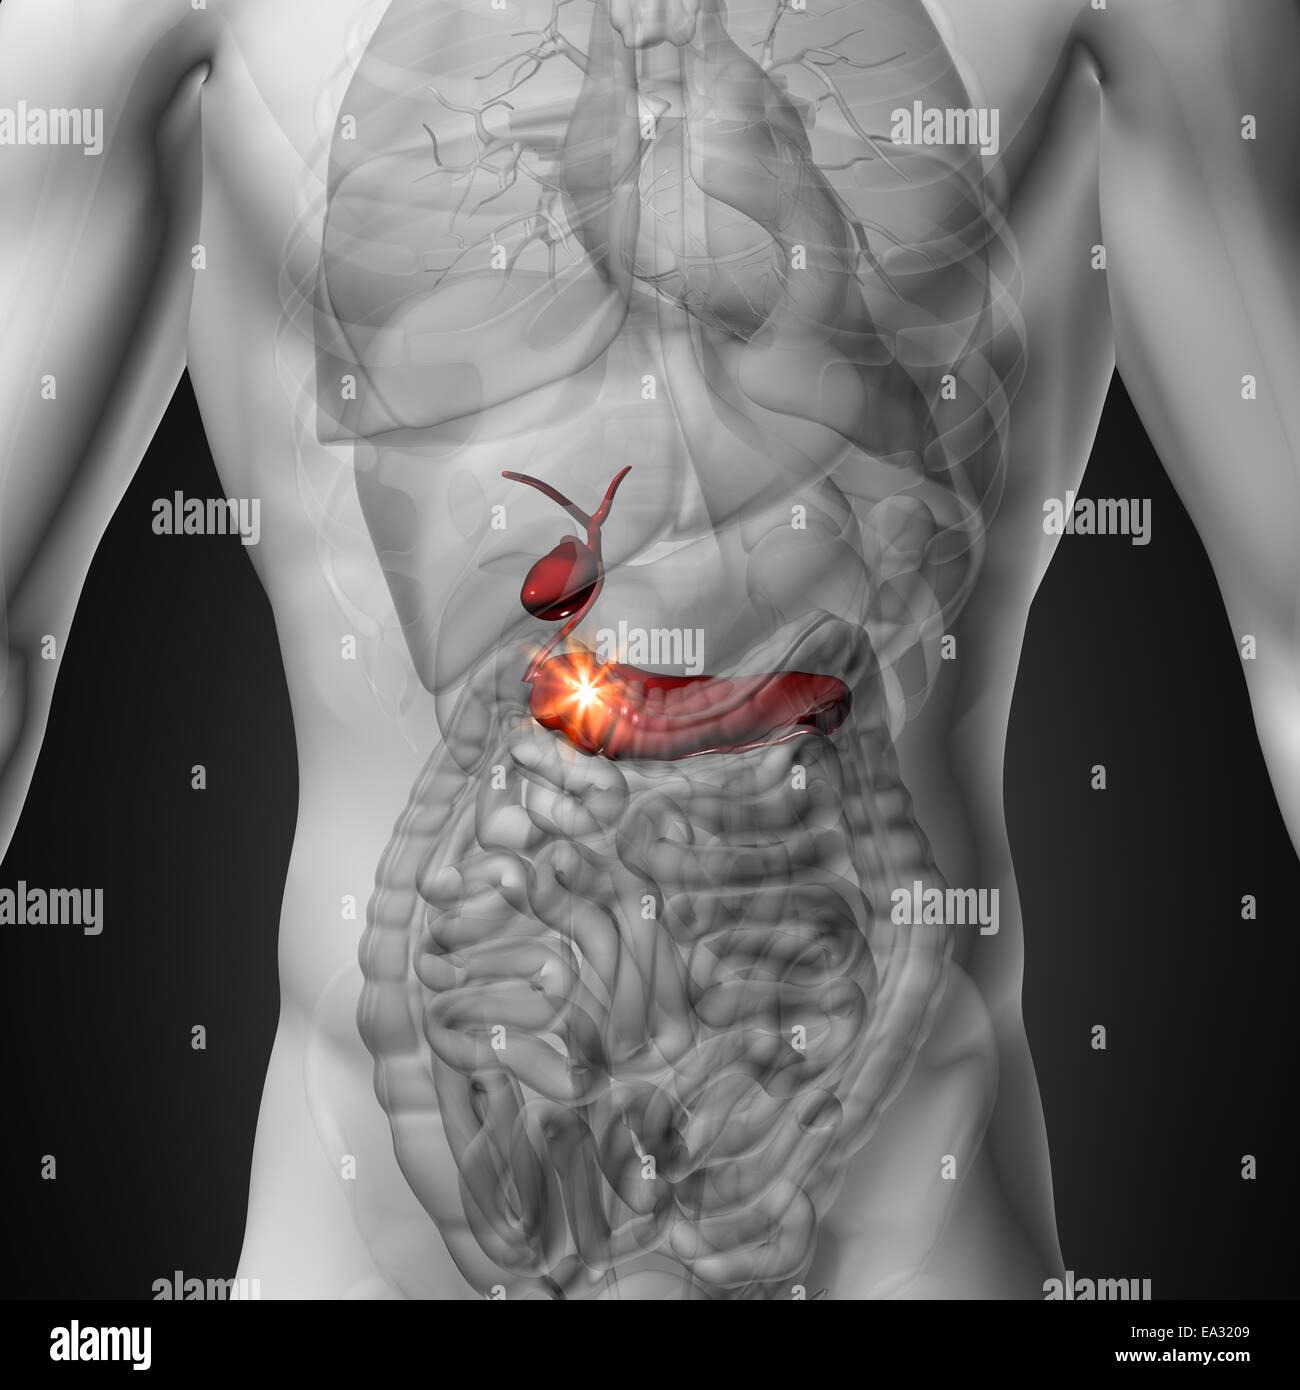 Panreas Anatomy Diagram Male Organ - Electrical Work Wiring Diagram •